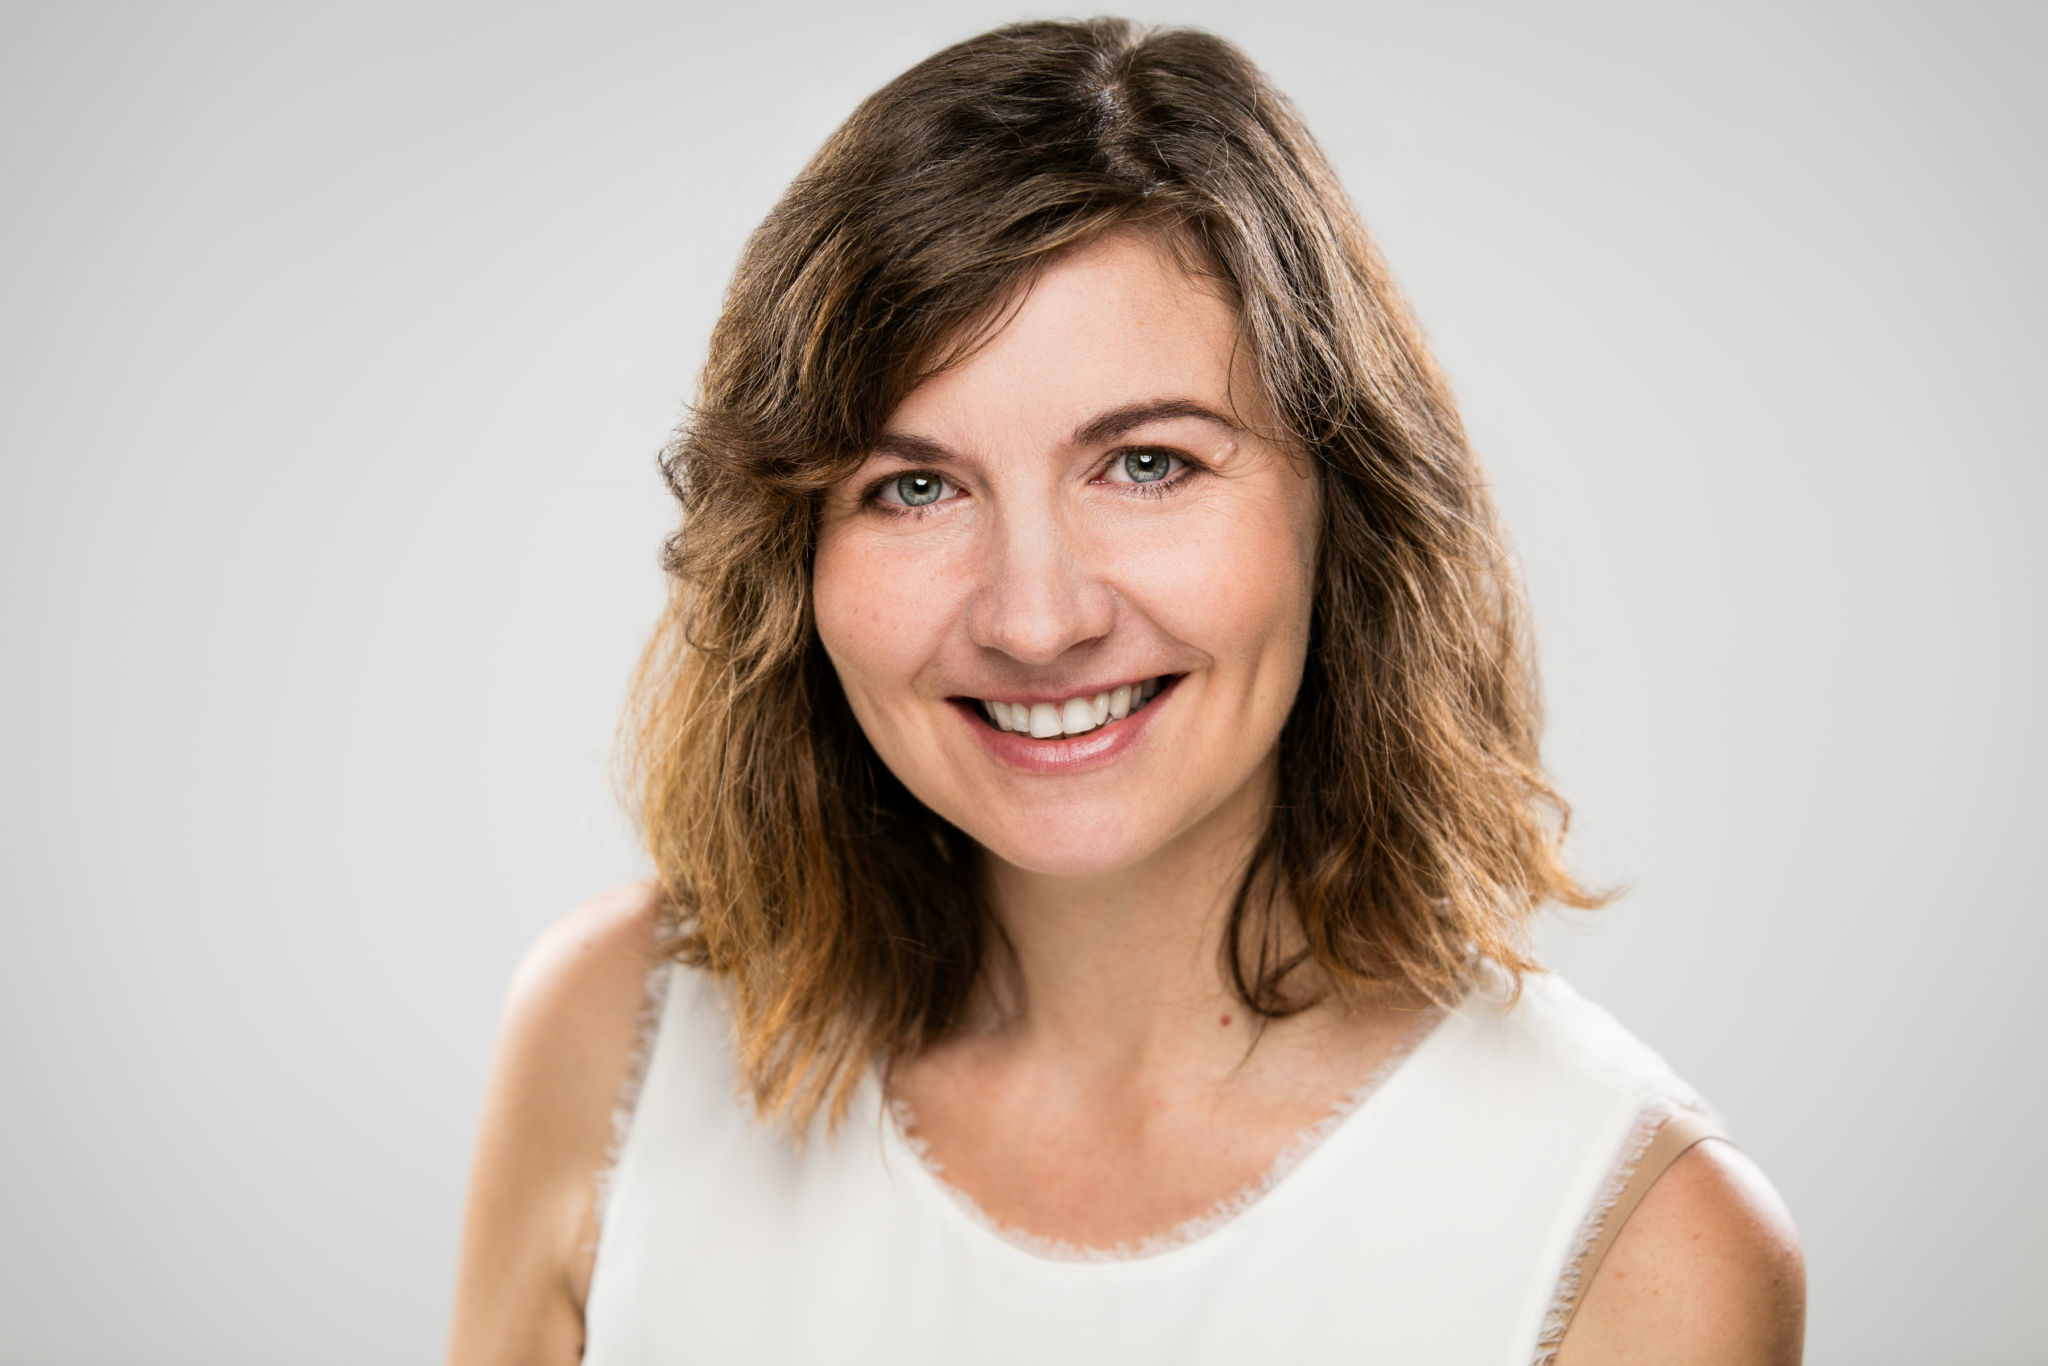 Aurélie Arnaud headshot